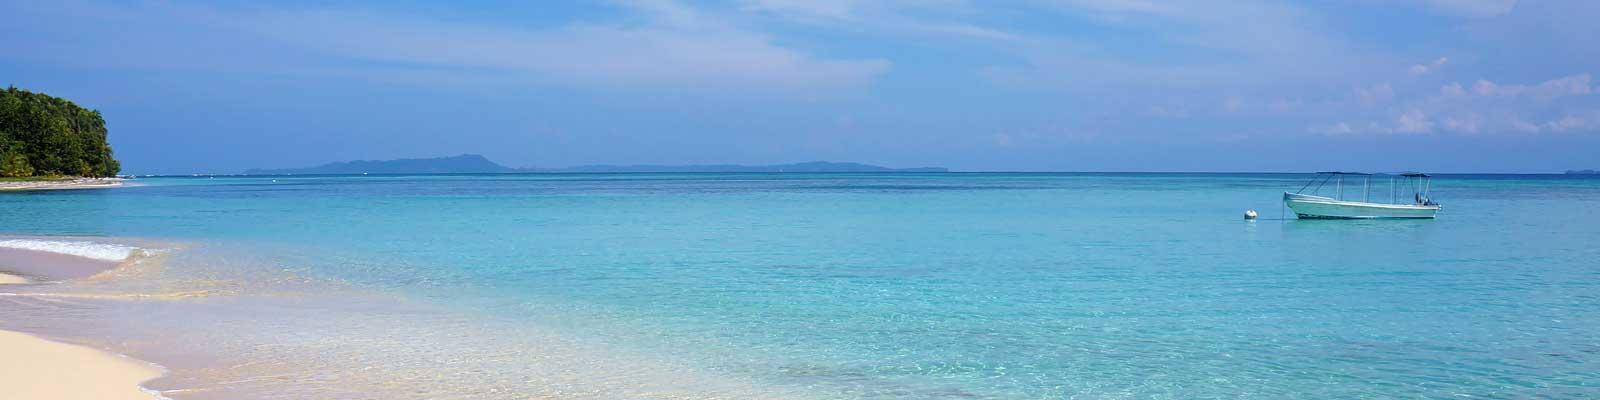 Panama Tranquilo Mar Azul